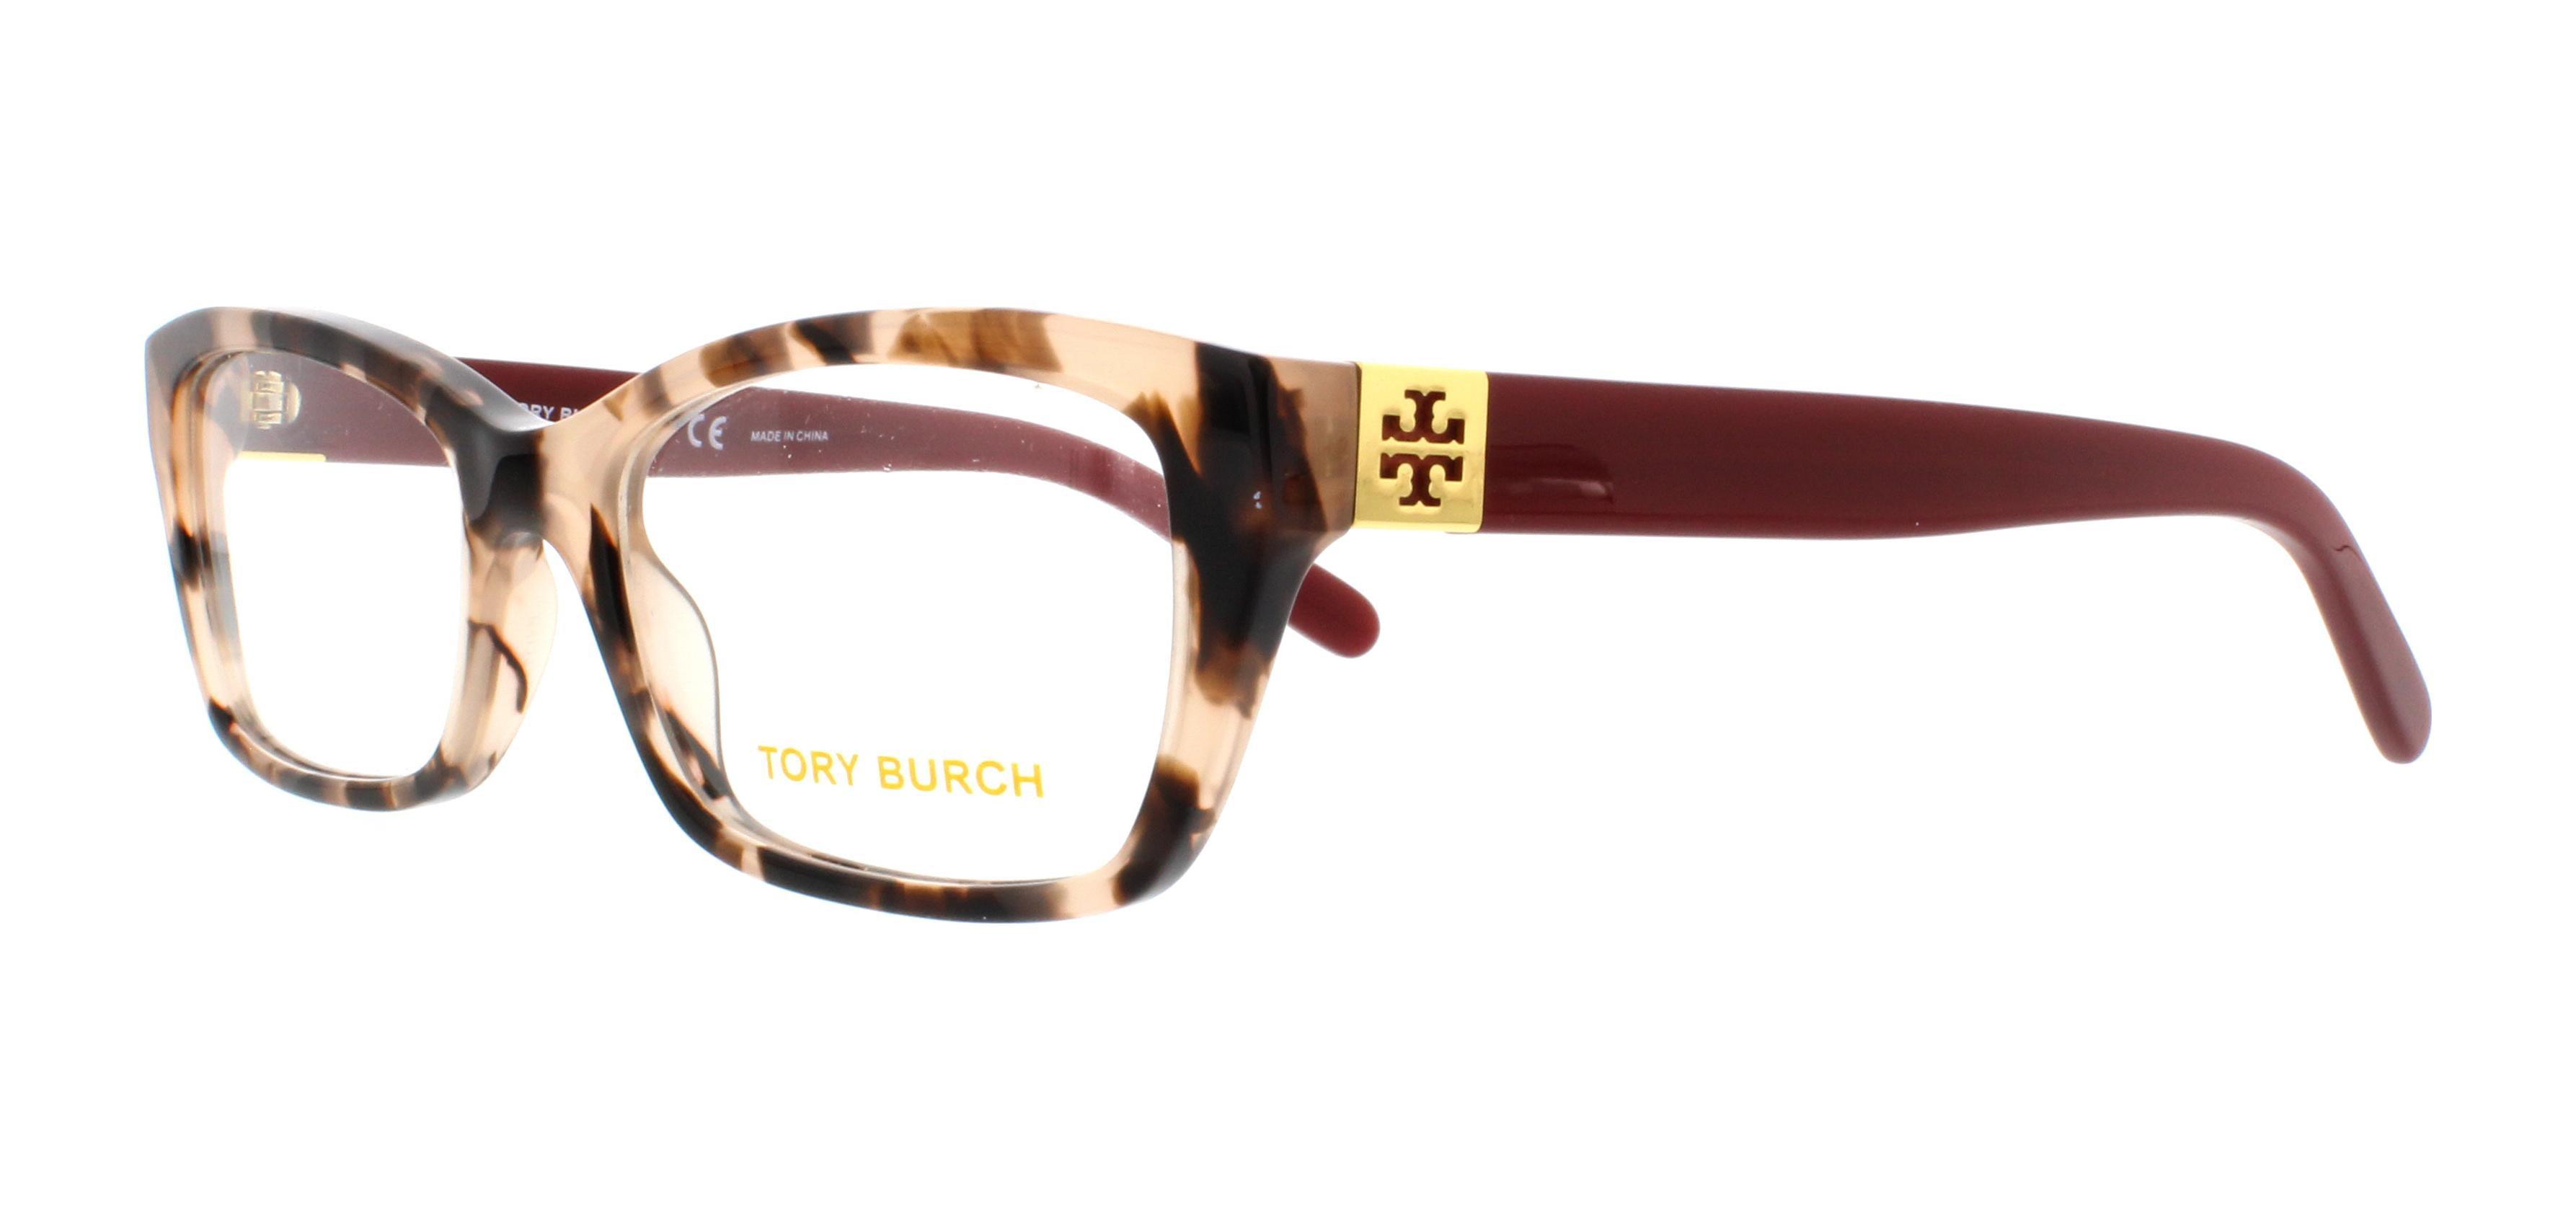 TORY BURCH Eyeglasses TY2049 1363 Blush Tortoise Cabernet 51MM ...